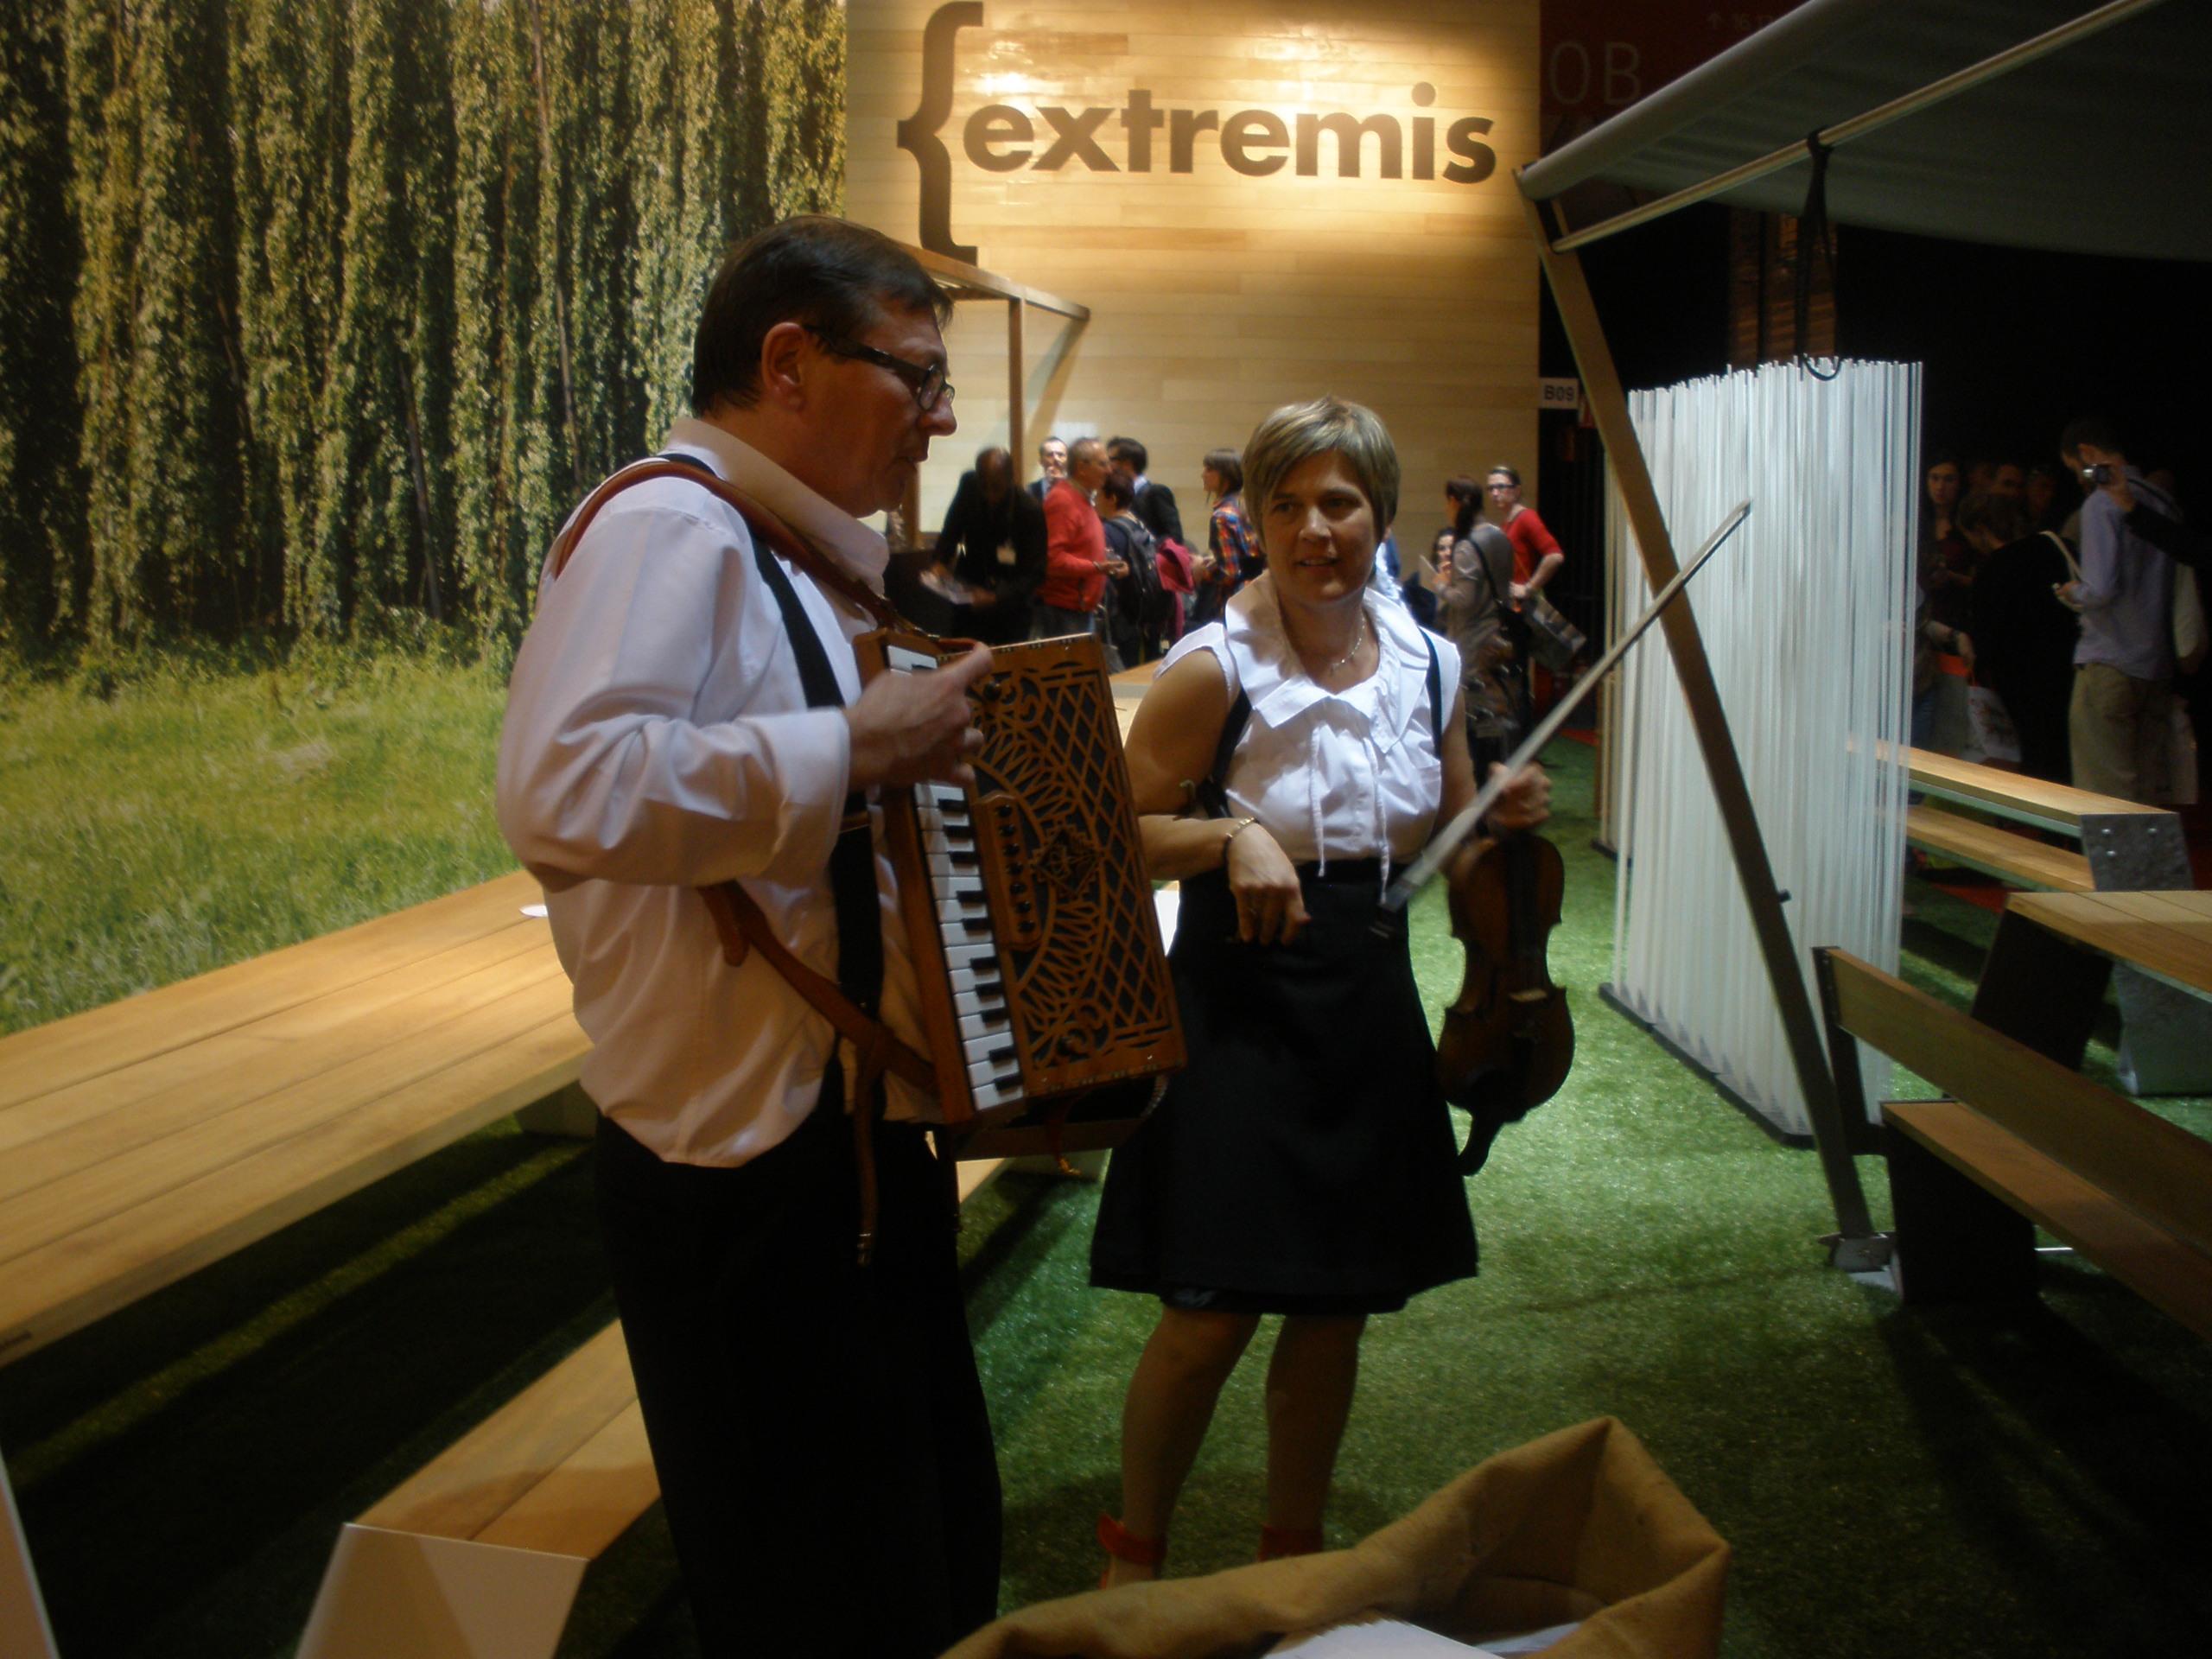 Extremis Party, Feria del Mueble